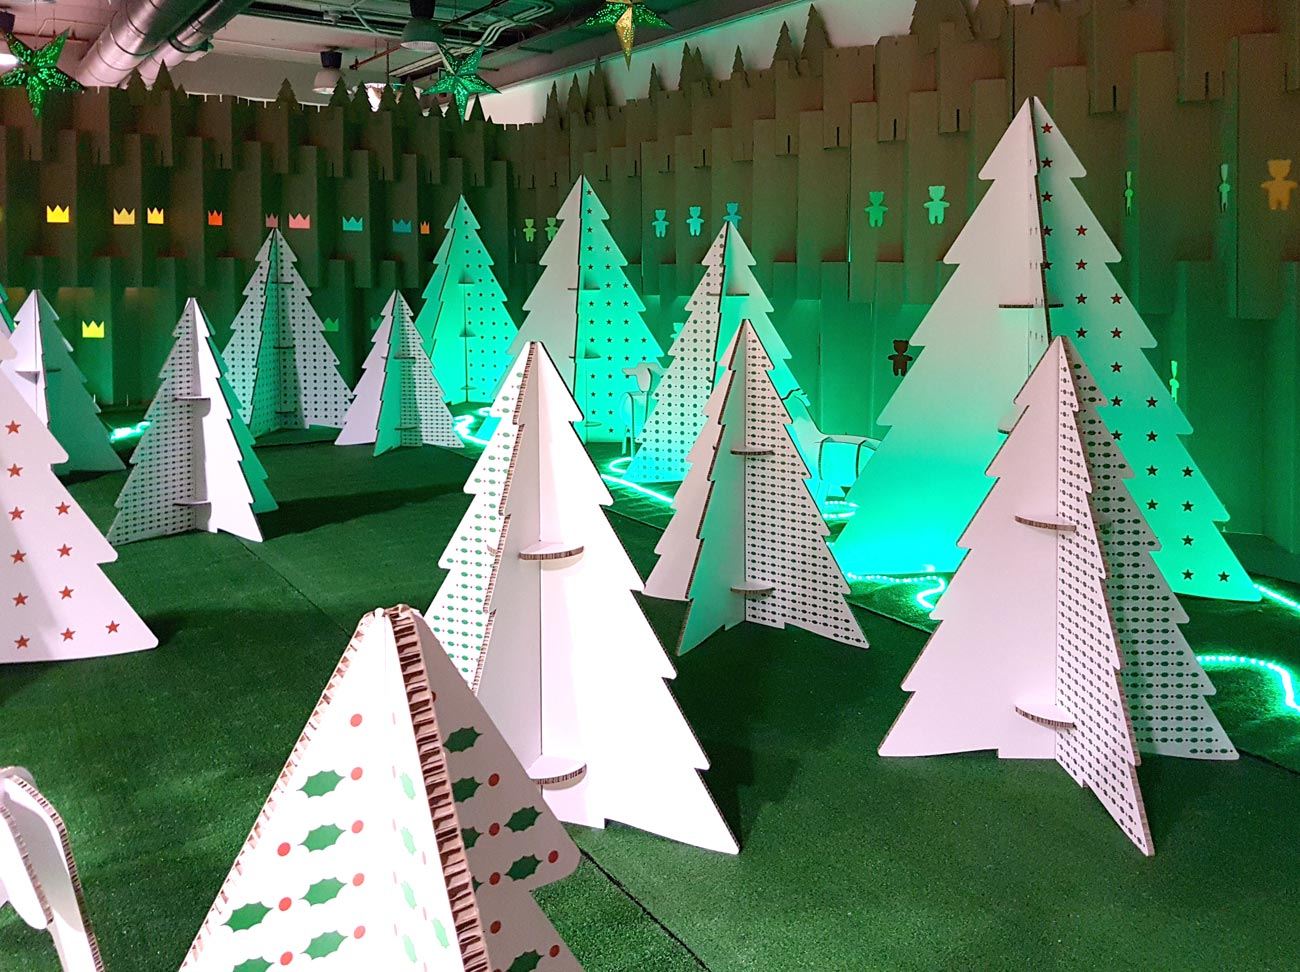 Decoraci n navide a en centro comercial habaneras - Decoracion de arboles navidenos para ninos ...